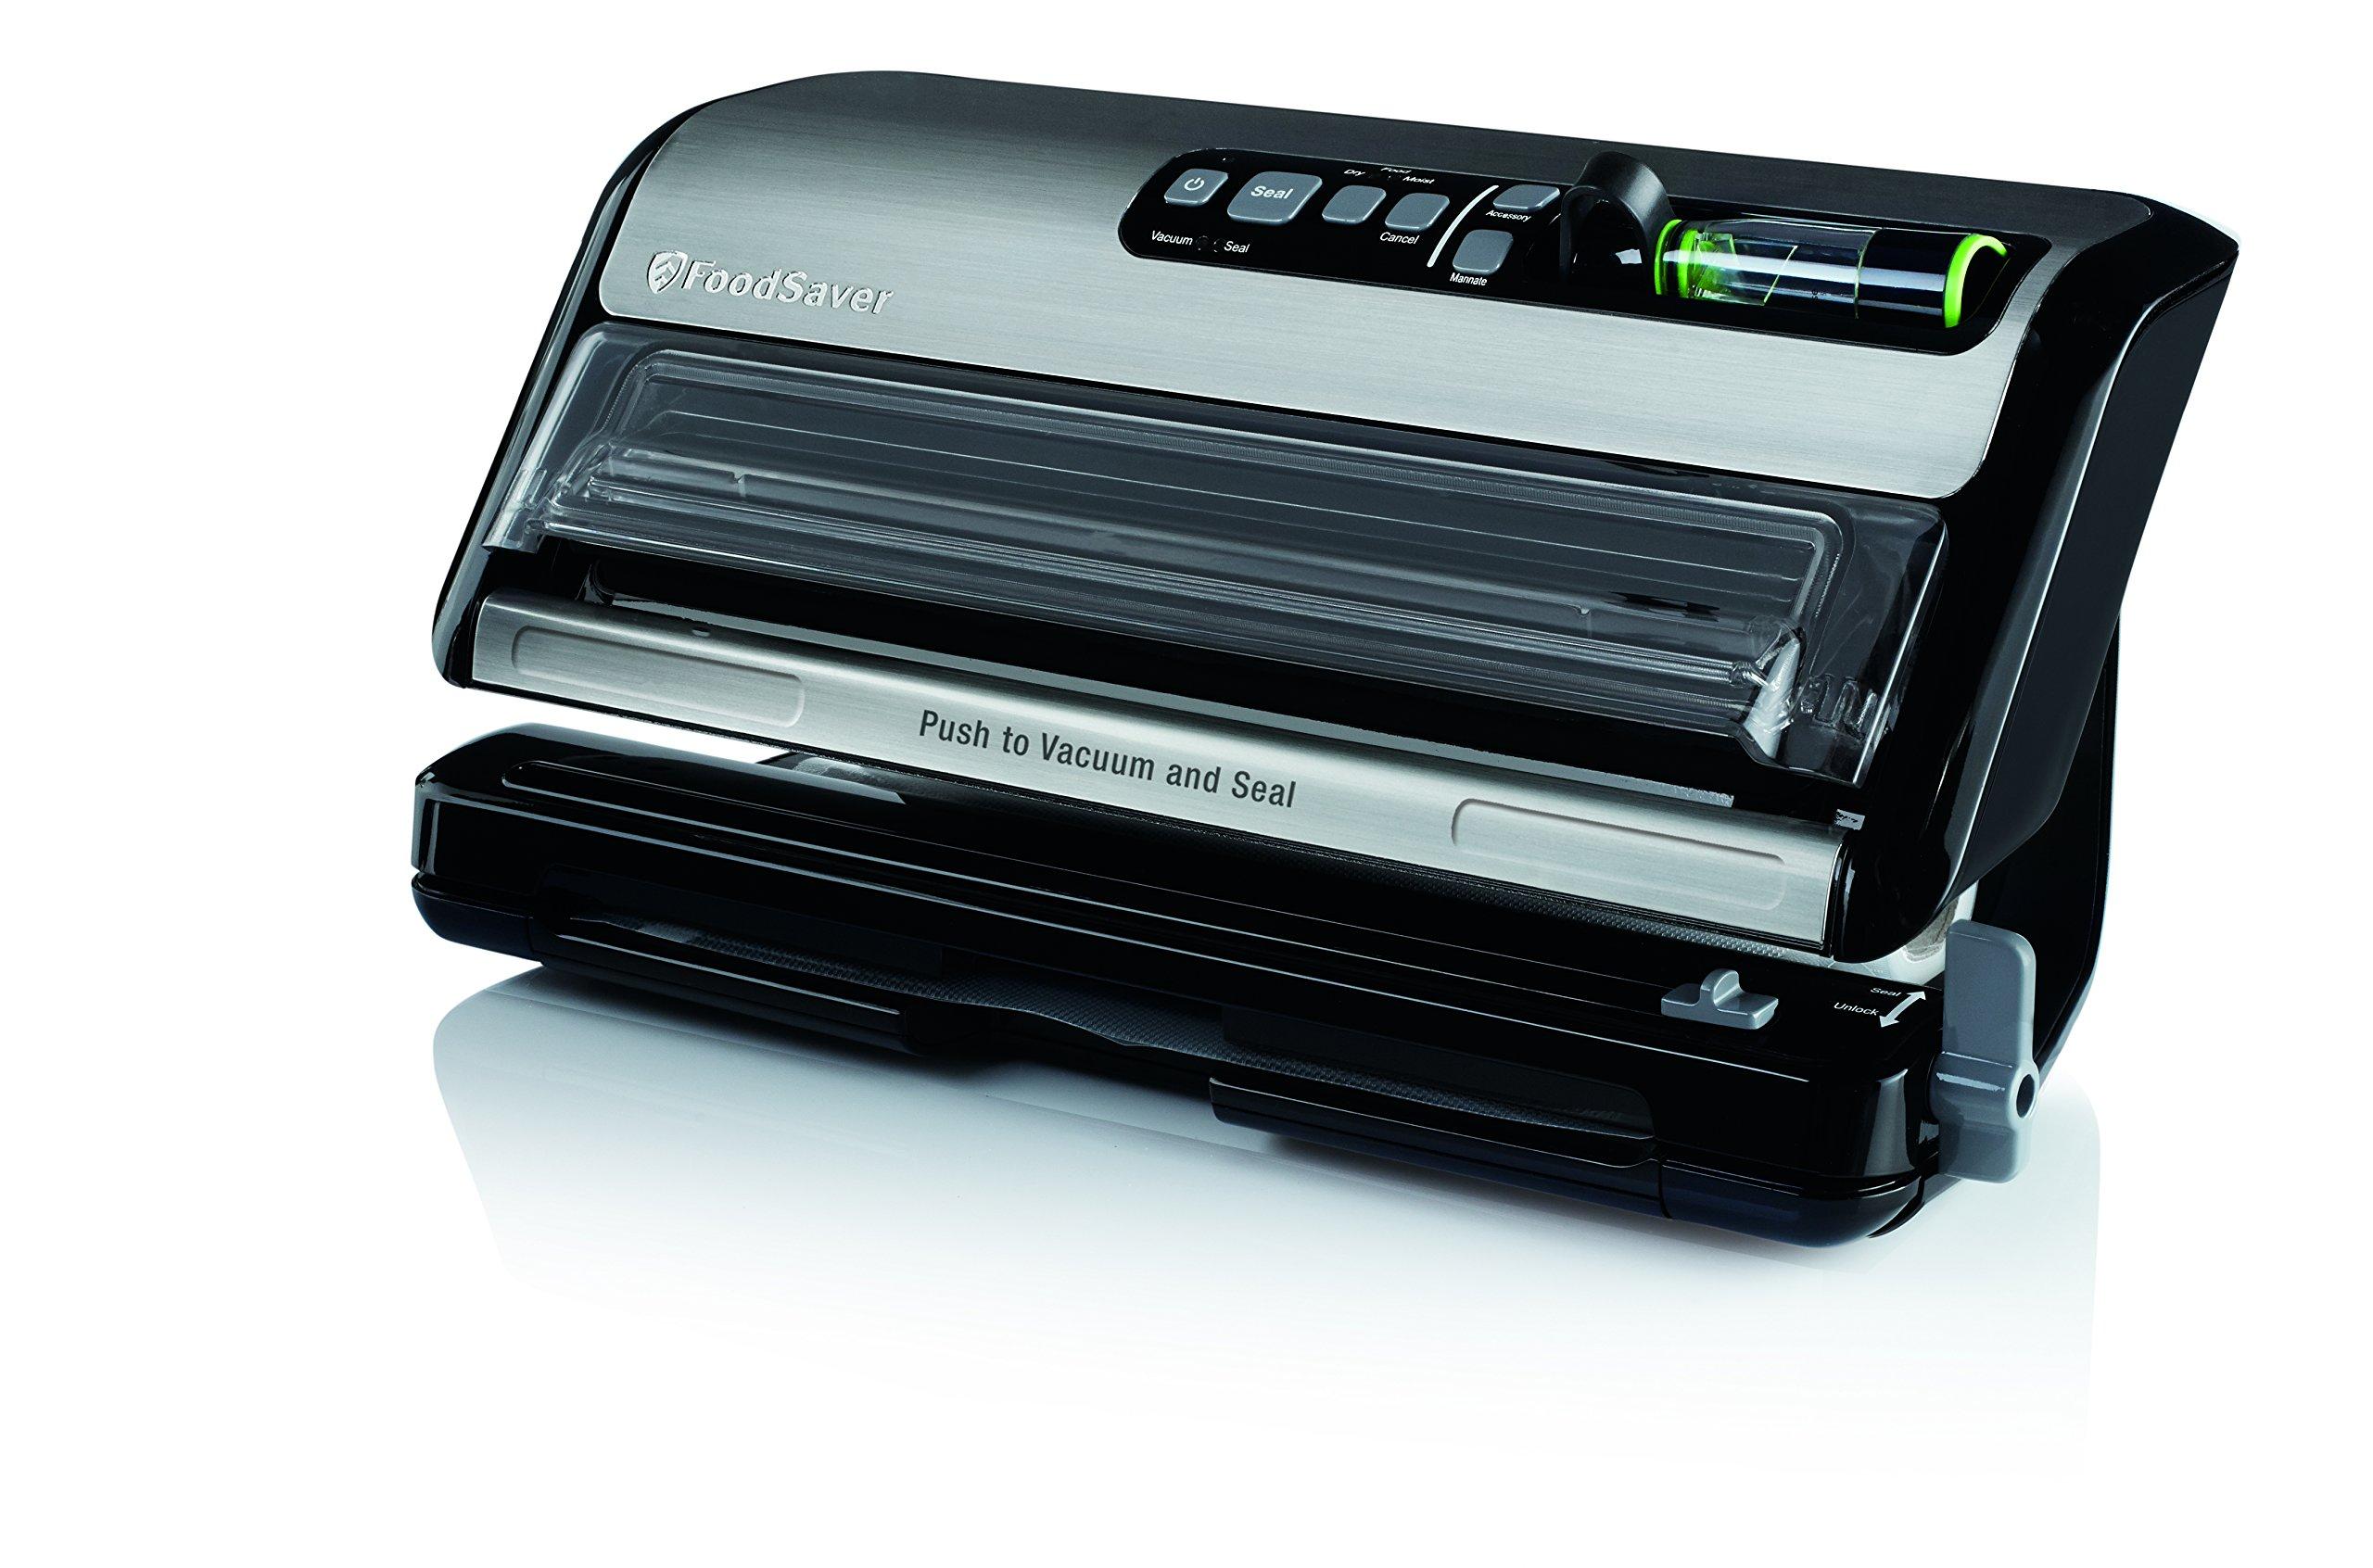 FoodSaver New FM5000 Series 2-in-1 Vacuum Sealing System Plus Starter Kit, FM5200